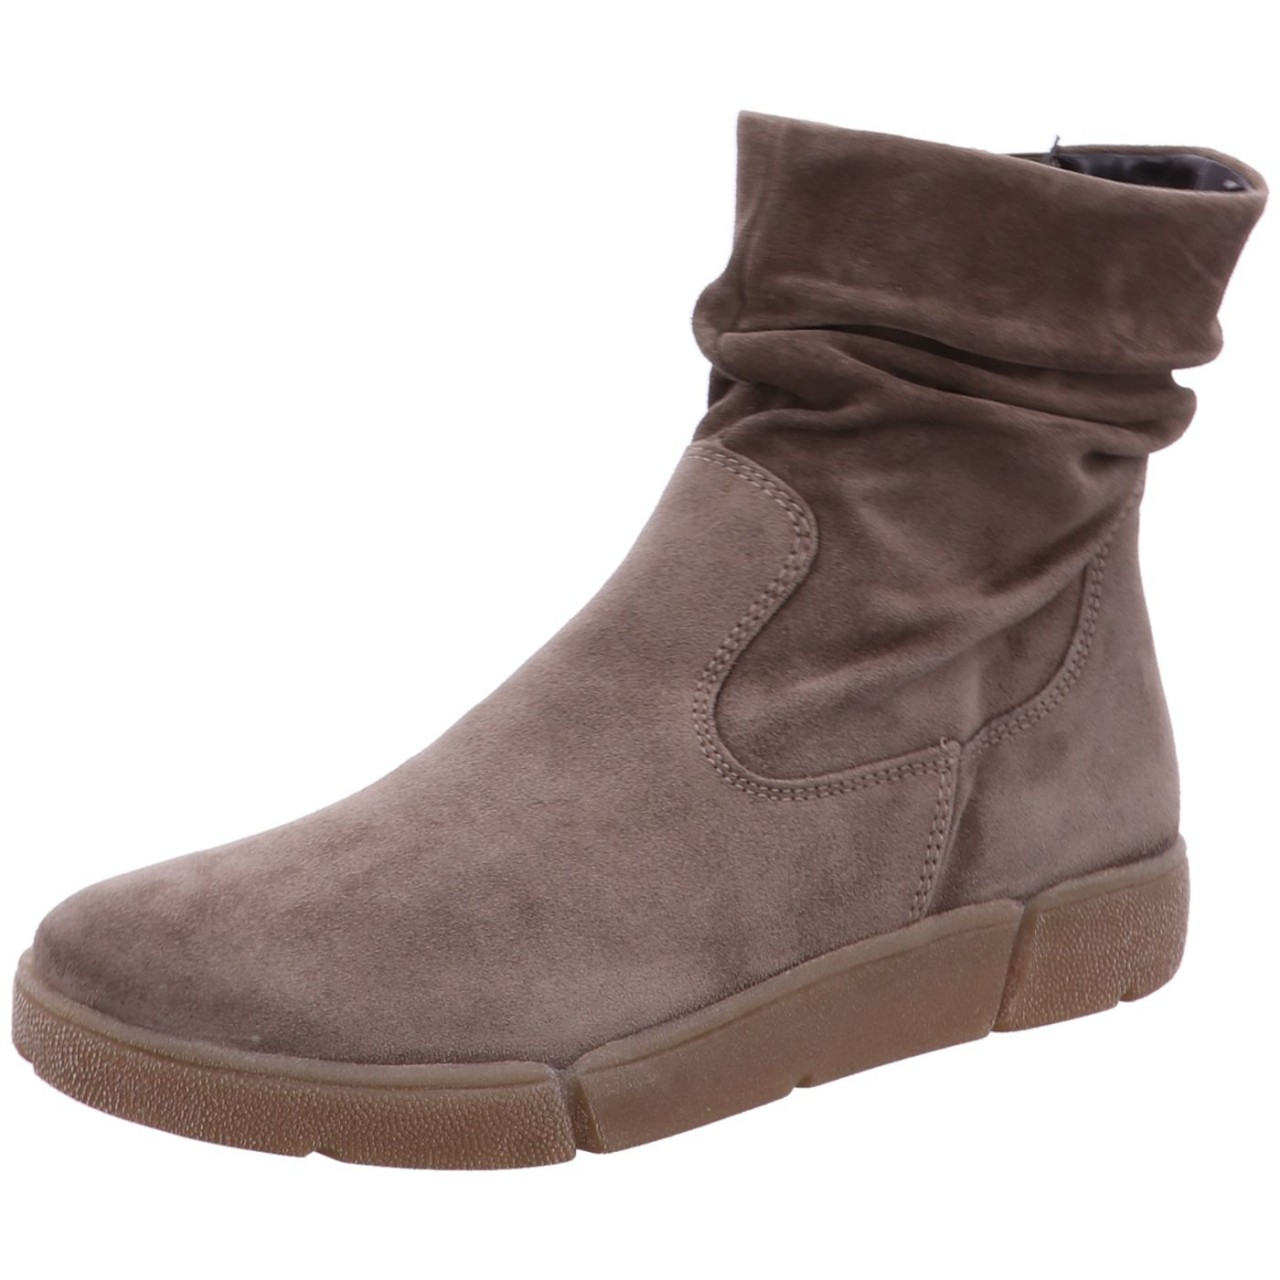 Ara Boot ROM Braun TEAK 07 14437-07